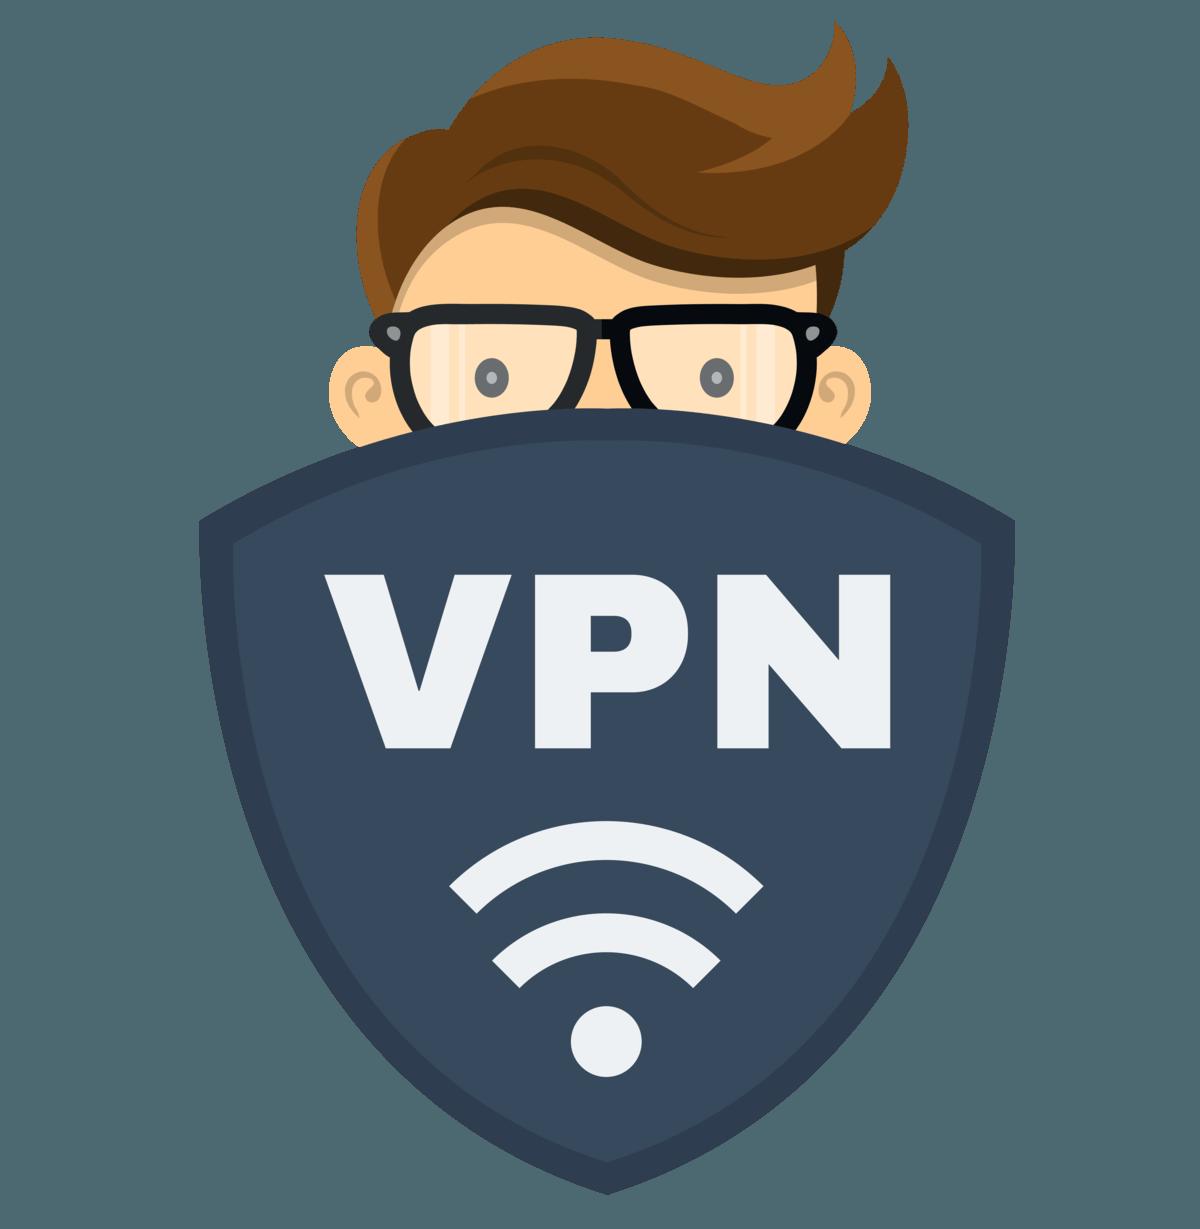 f0e4570802b8ac15e40949e65c94f11b - Why Is My Vpn Blocking My Internet